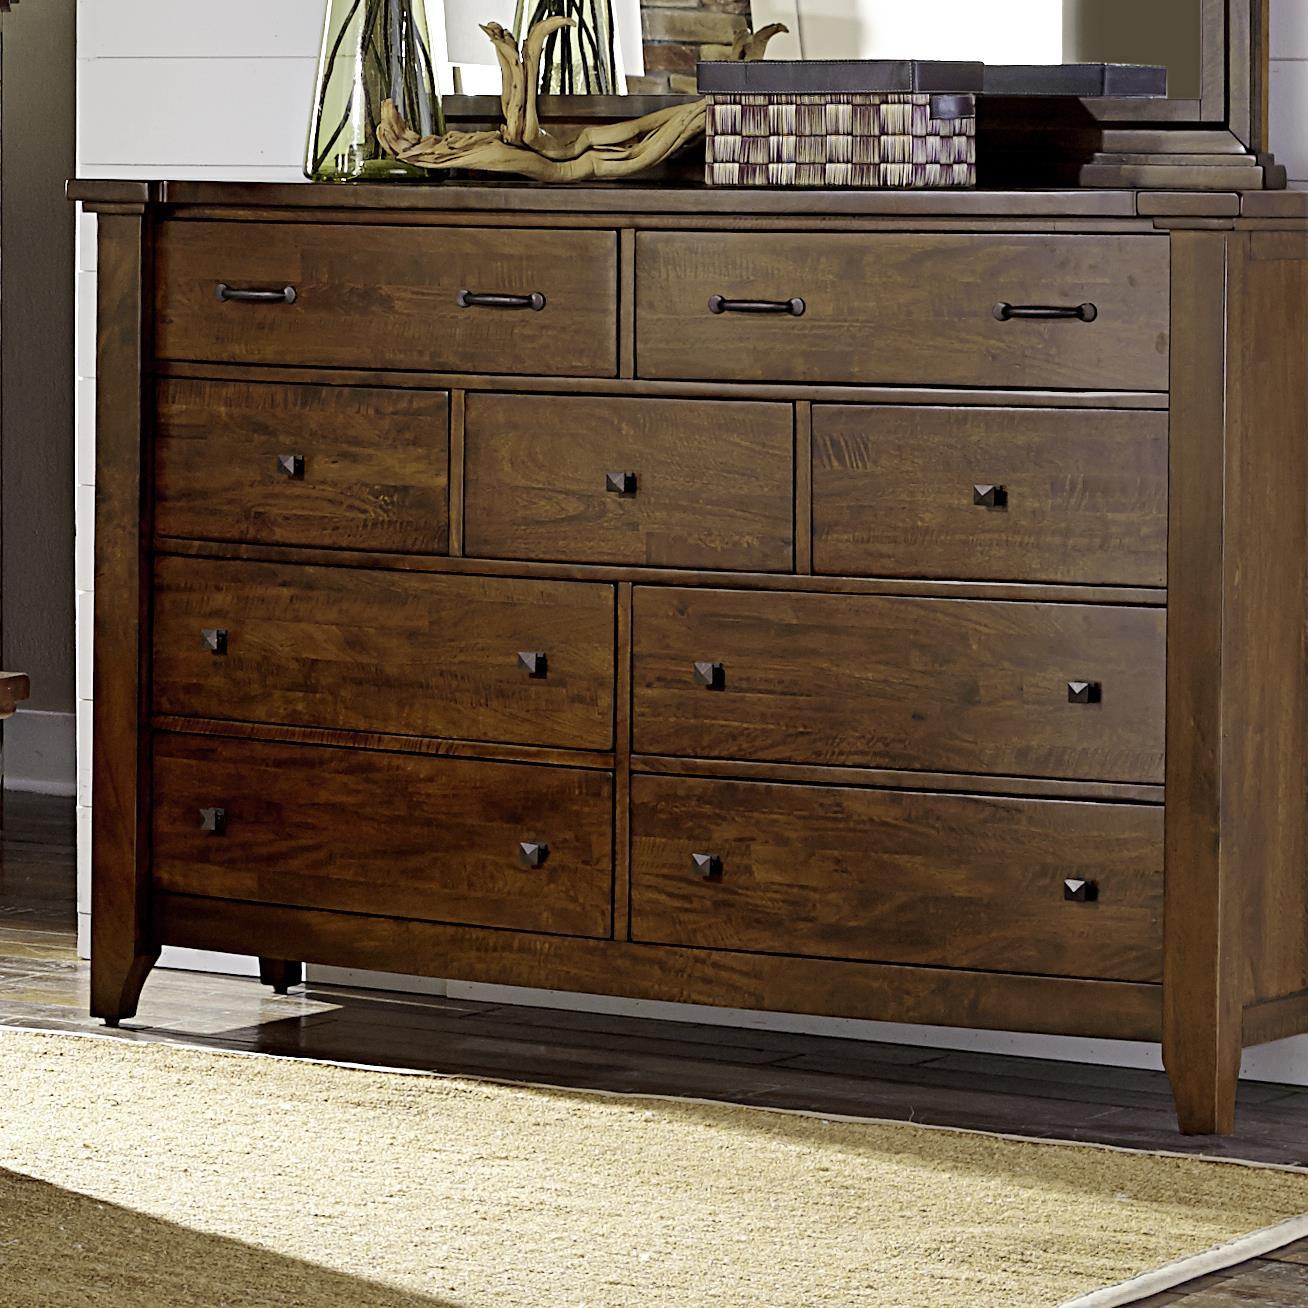 Genial Napa Furniture Designs Whistler Retreat9 Drawer Chest ...